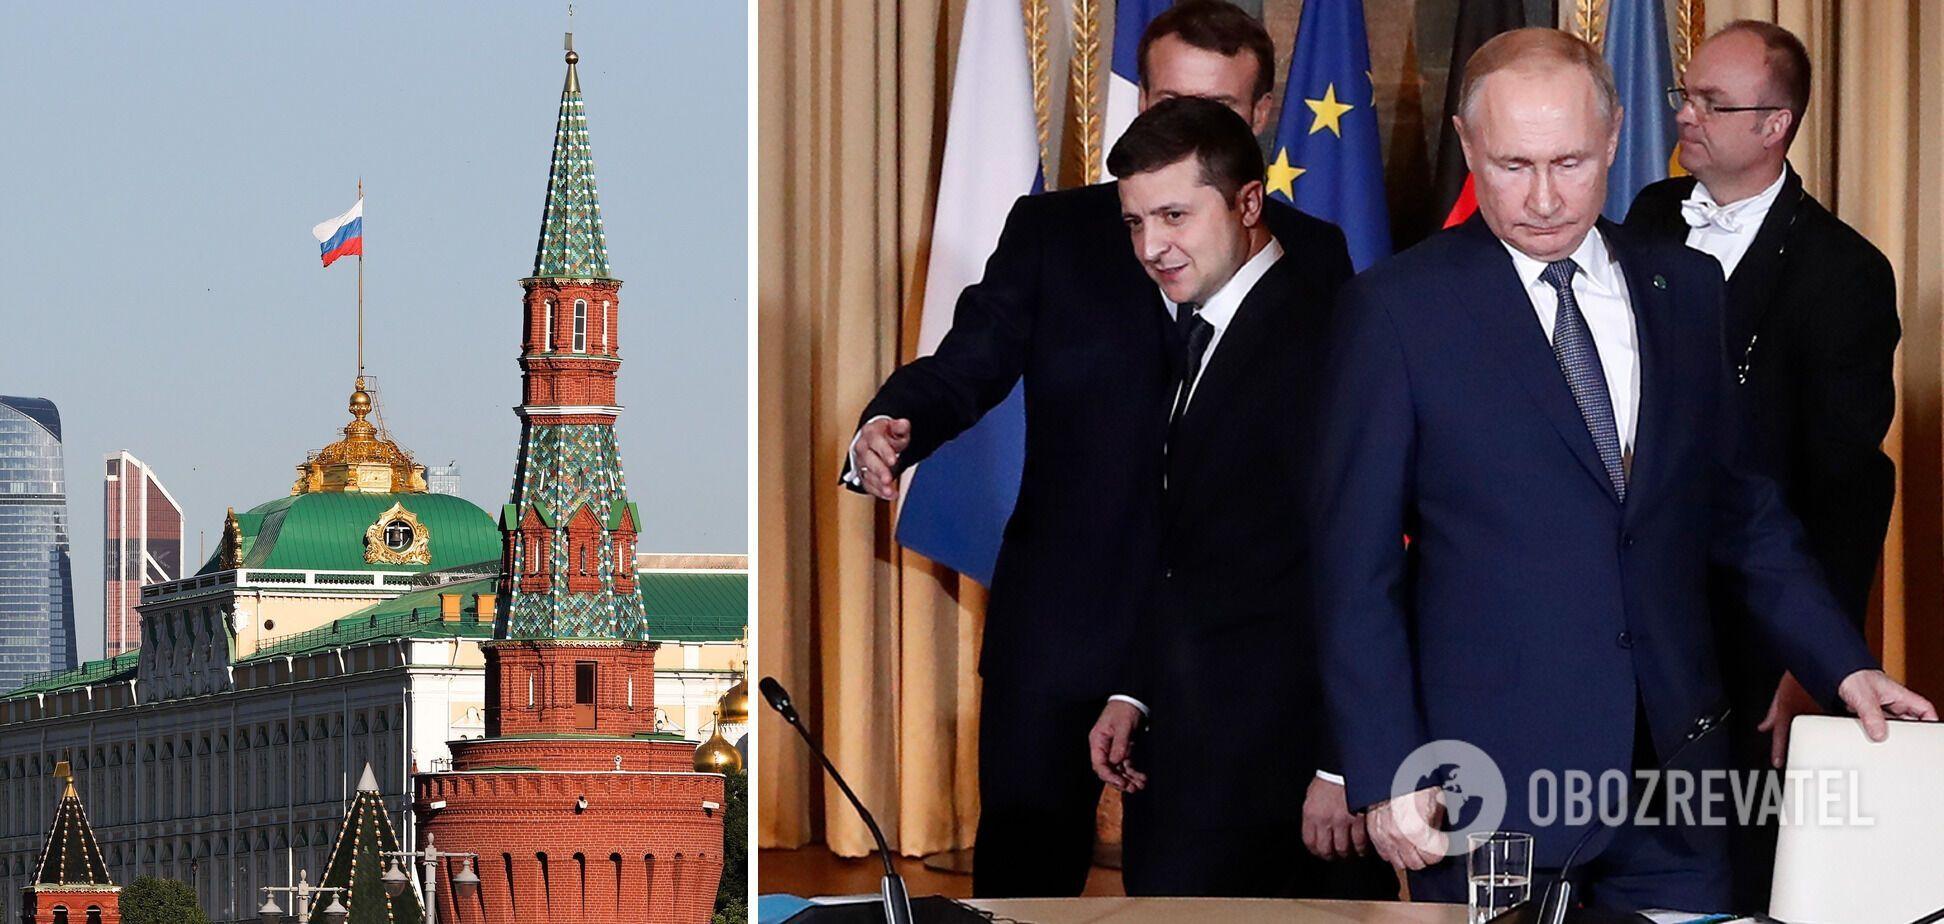 Путин избегает встречи с Зеленским